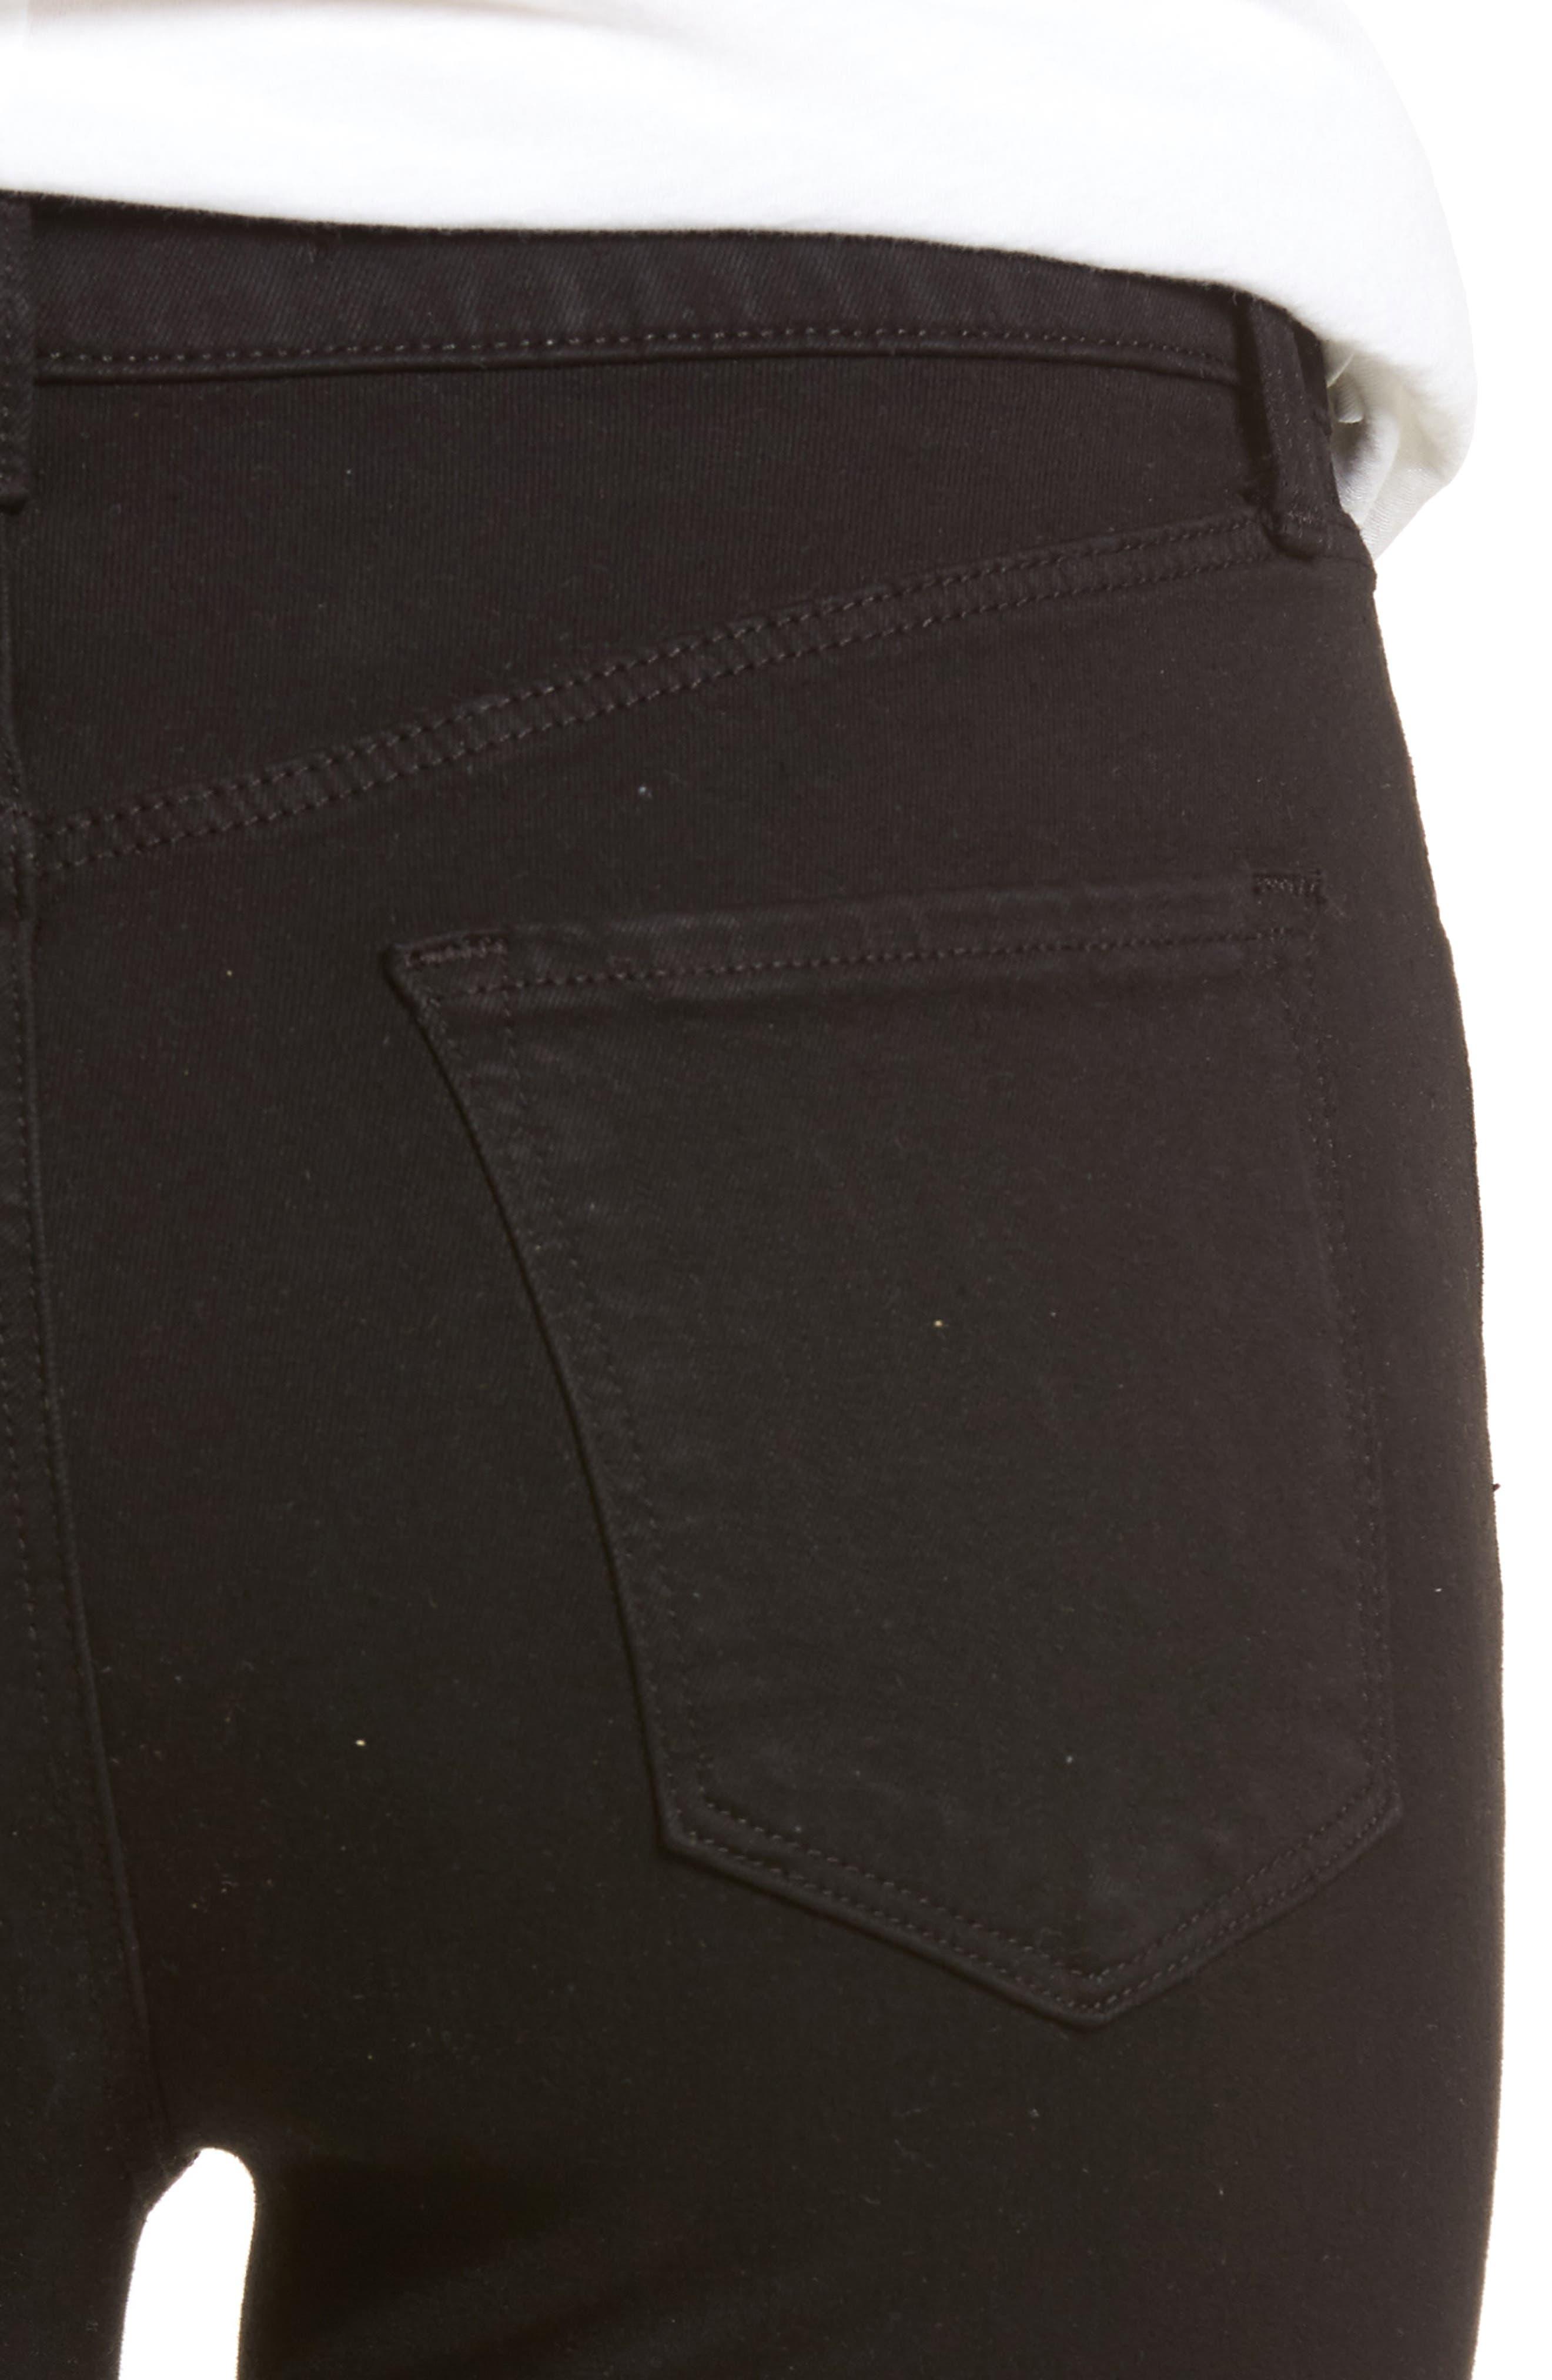 Maria High Waist Skinny Jeans,                             Alternate thumbnail 4, color,                             BLACK BASTILLE